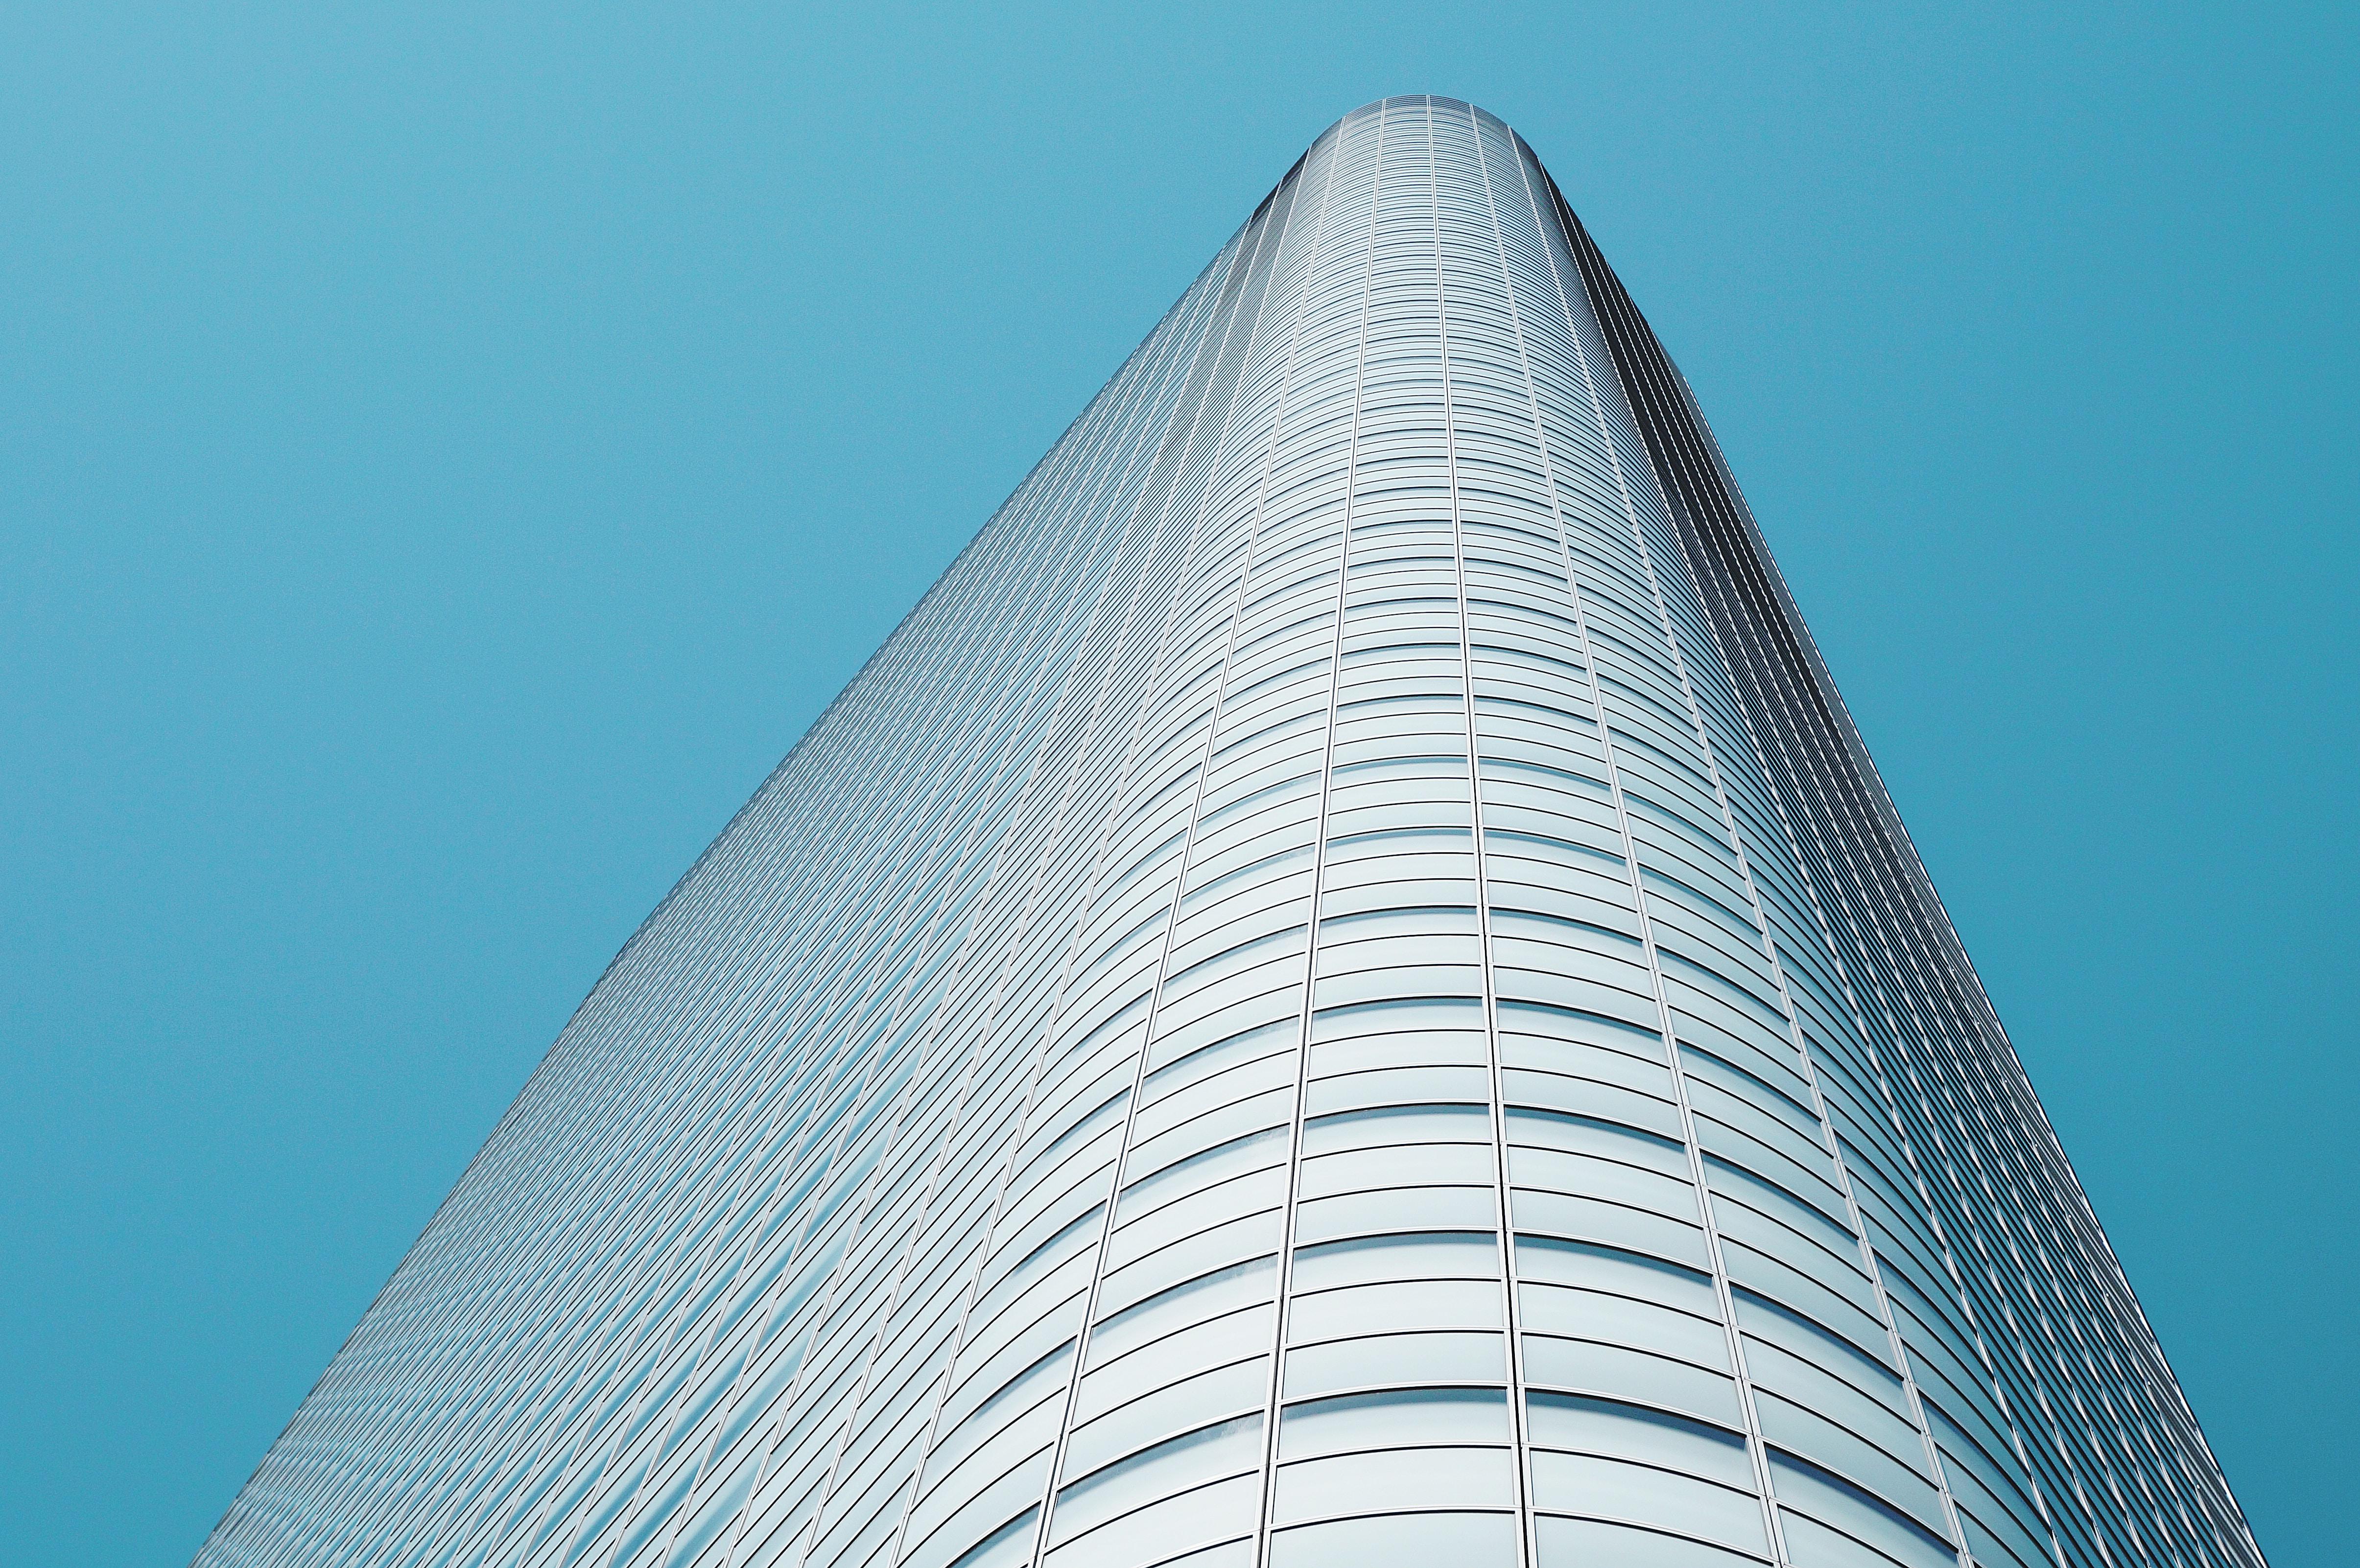 A round corner of a tall skyscraper in Tokyo